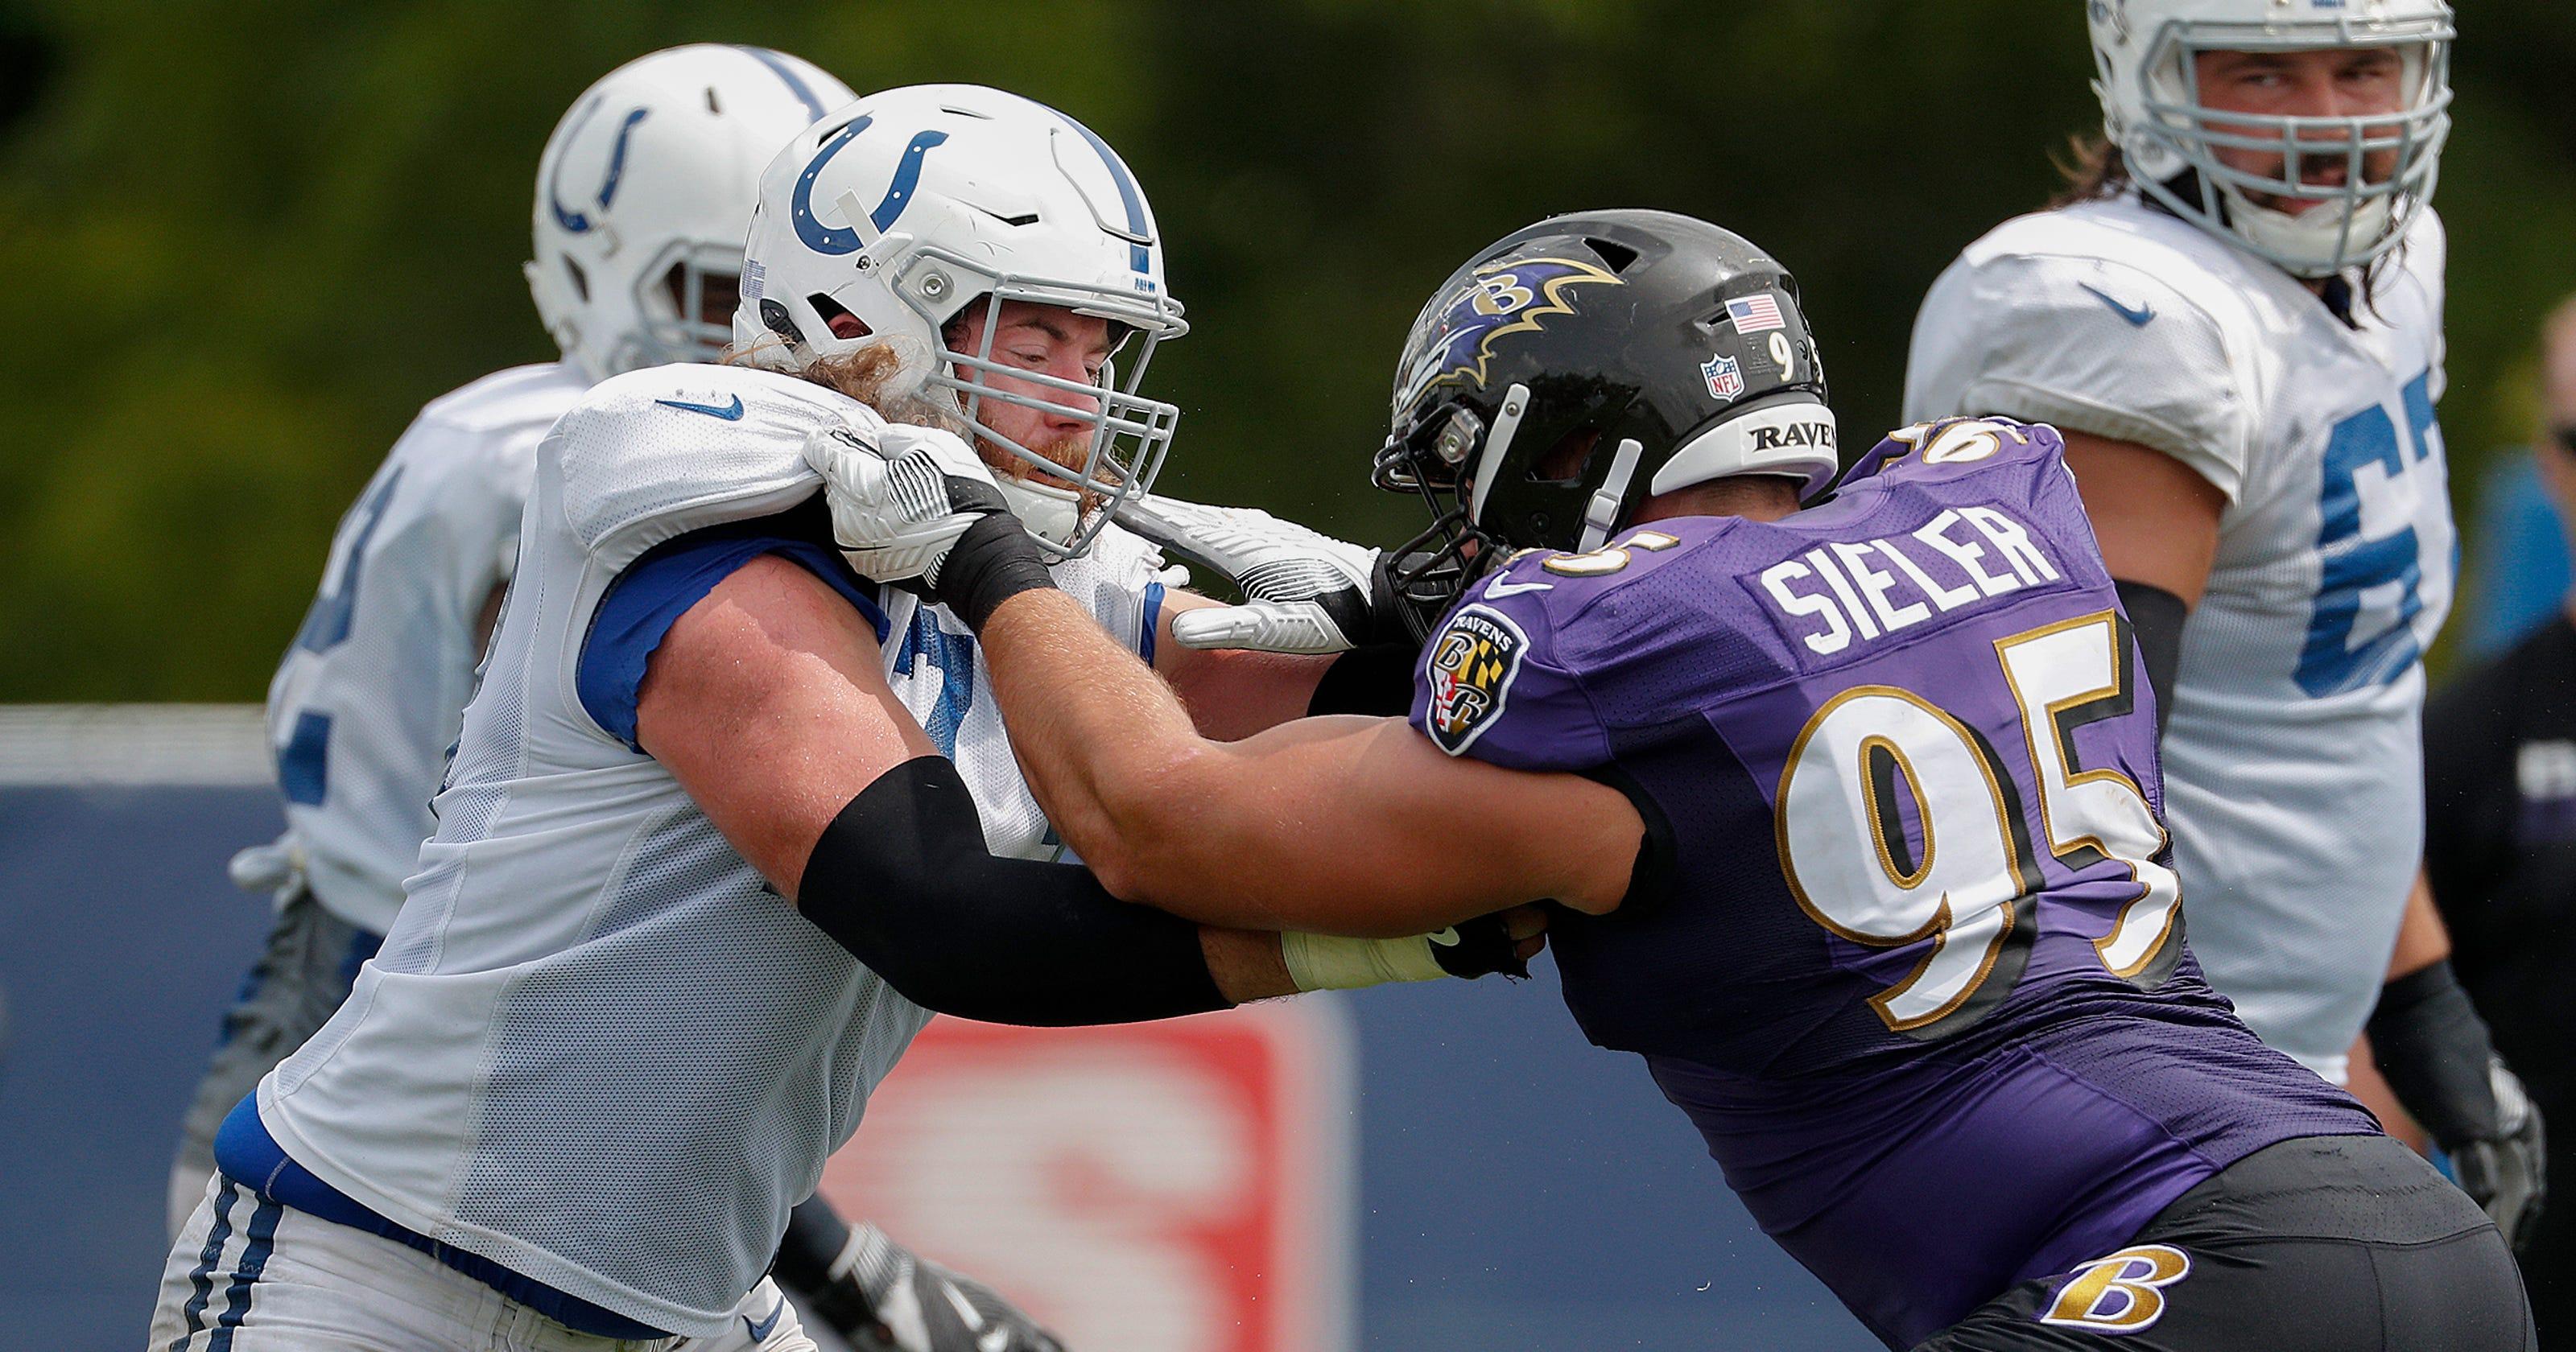 Colts Depth Chart Lists Joe Haeg Ryan Grant Margus Hunt Nate Hairston As Starters